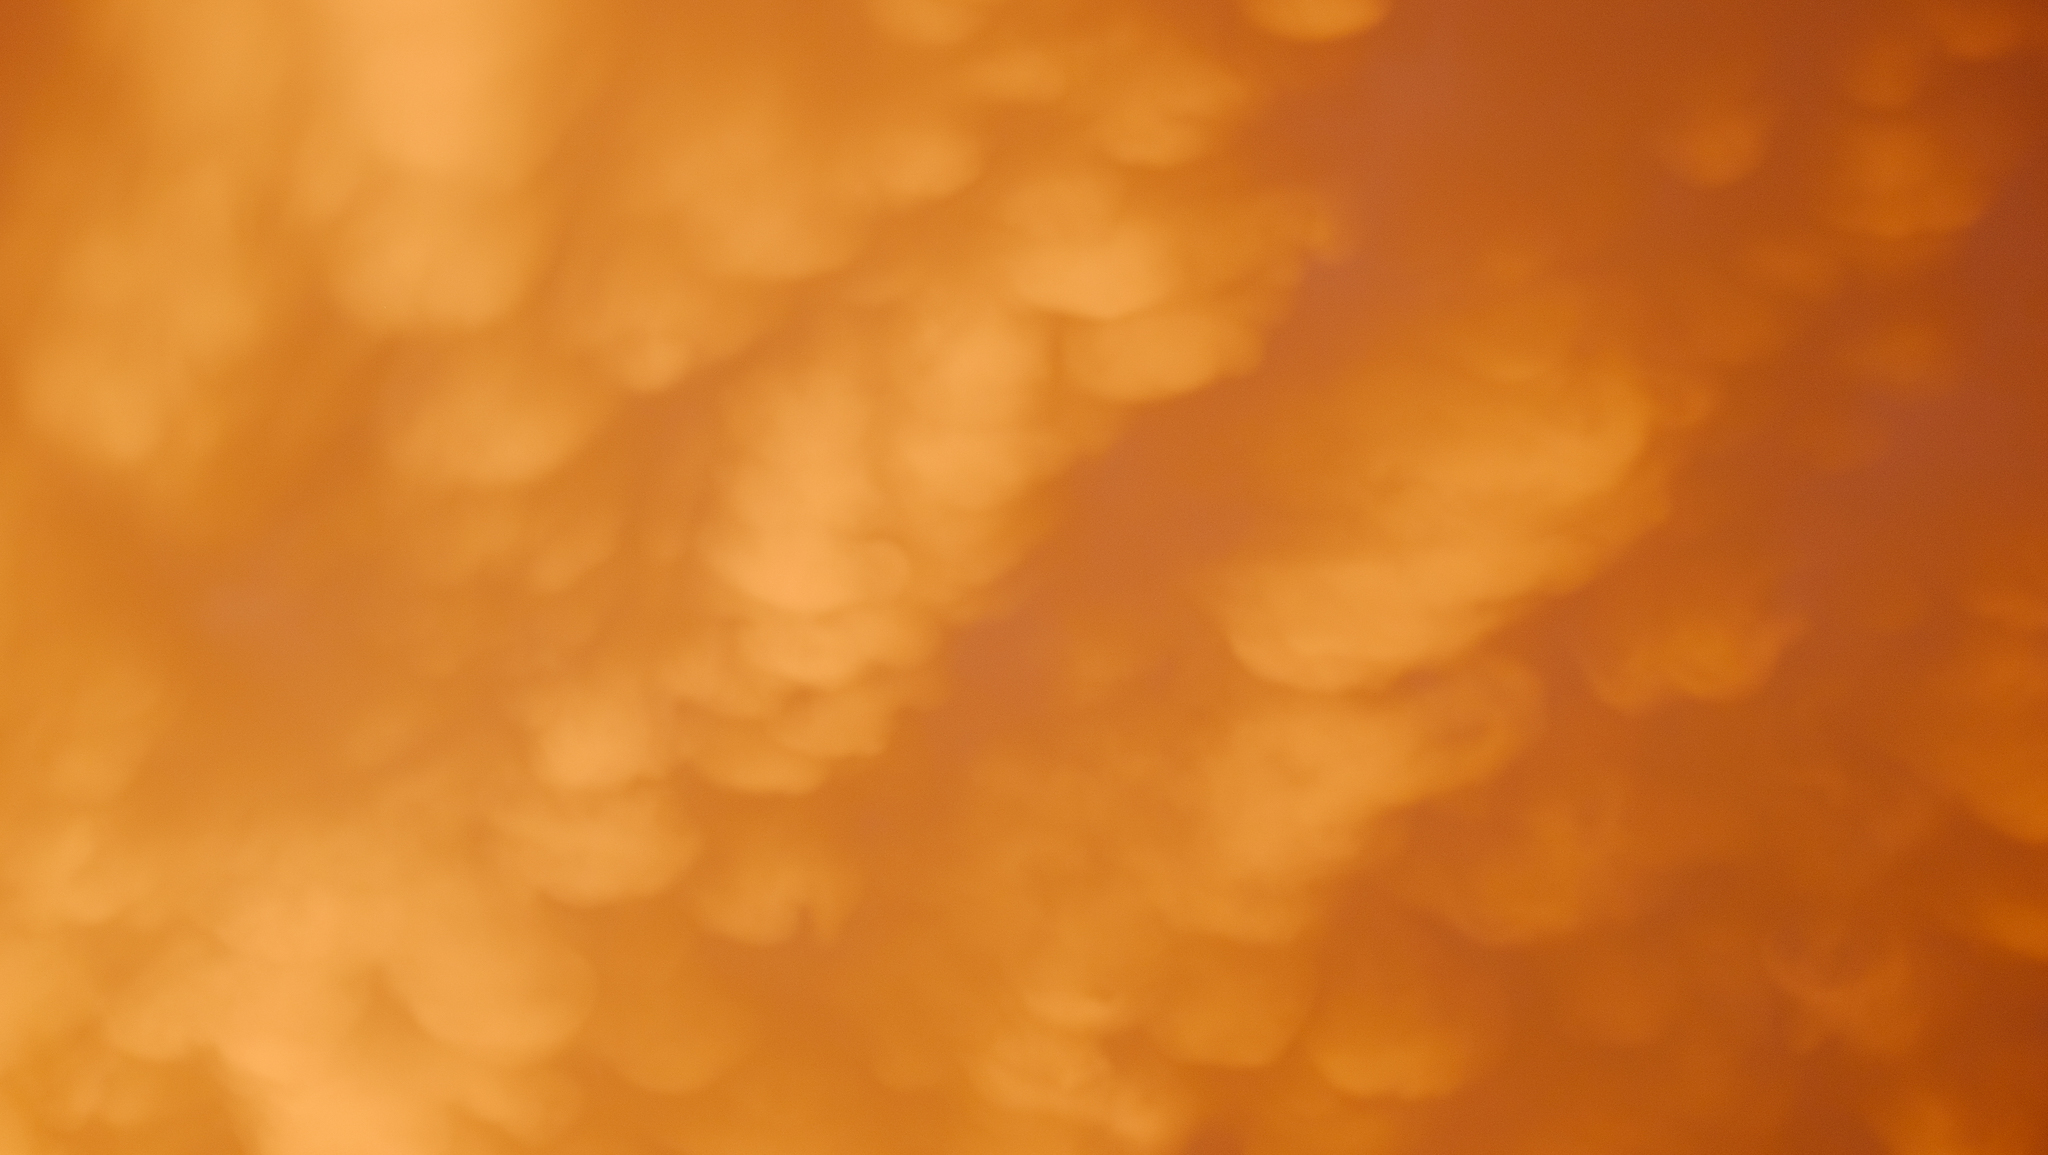 clouds-1236.jpg